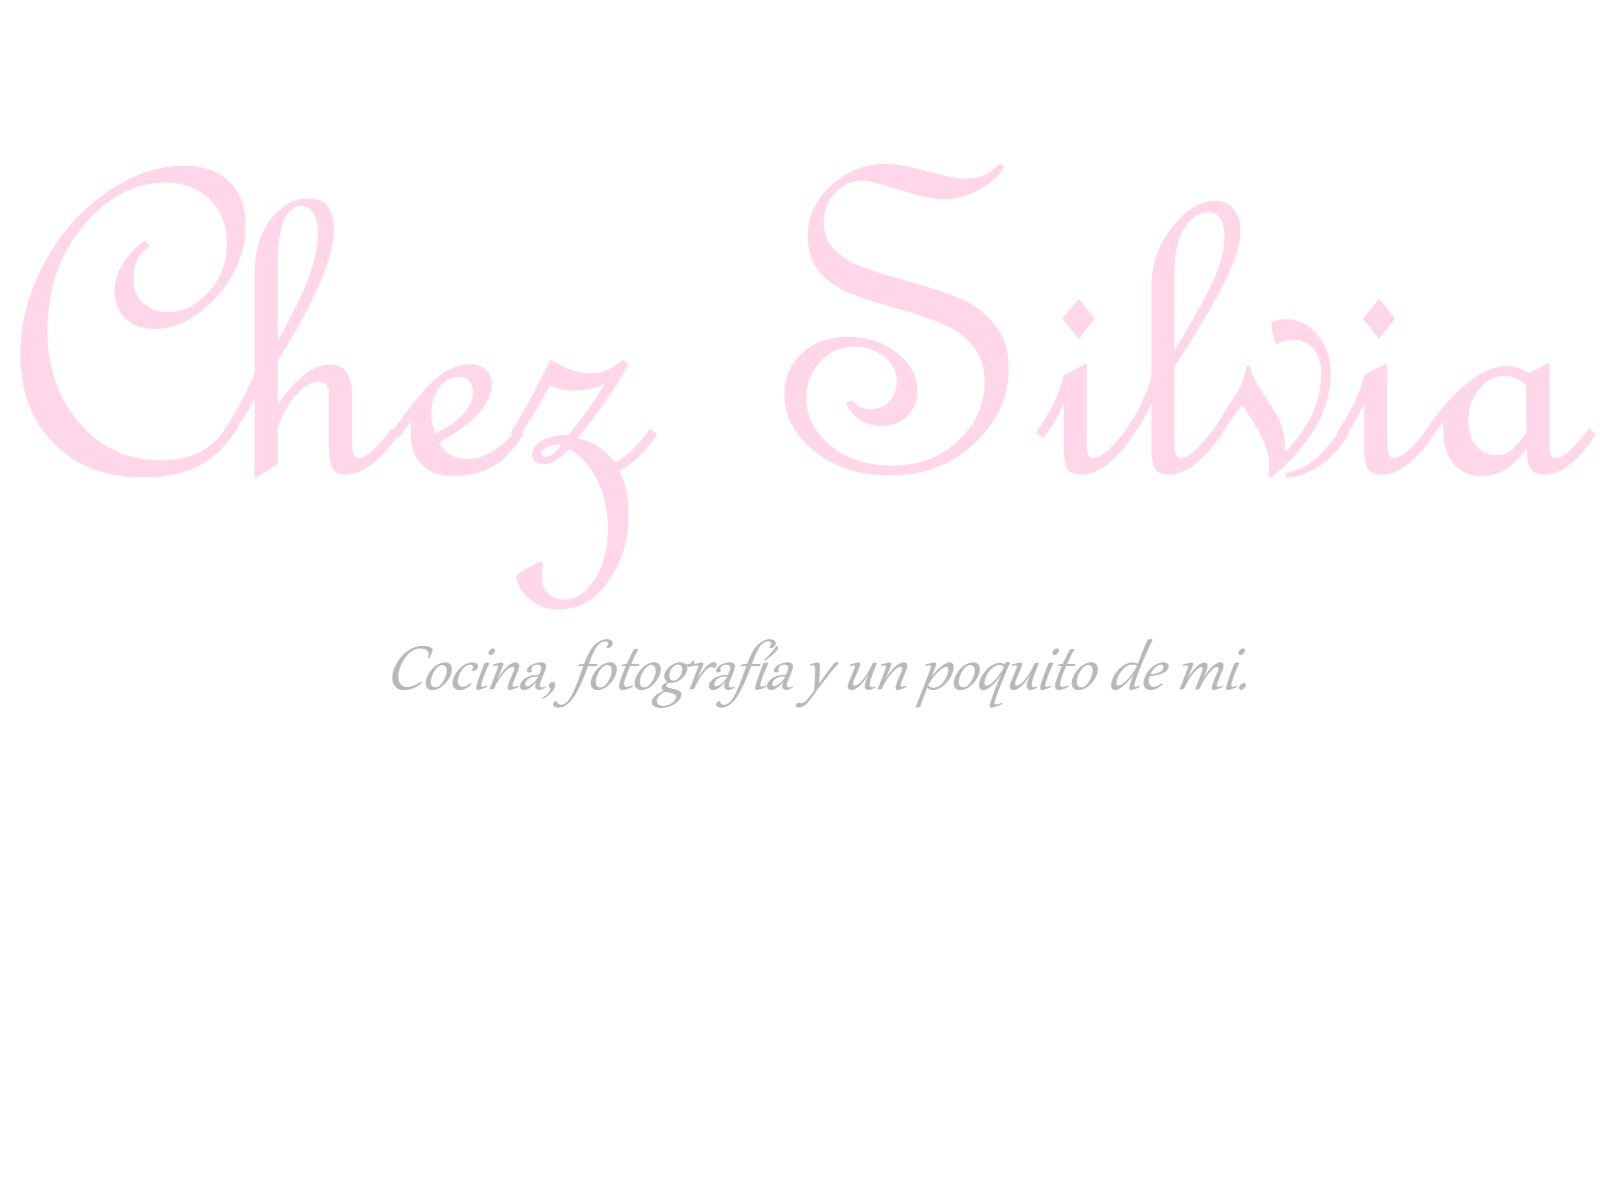 Chez Silvia